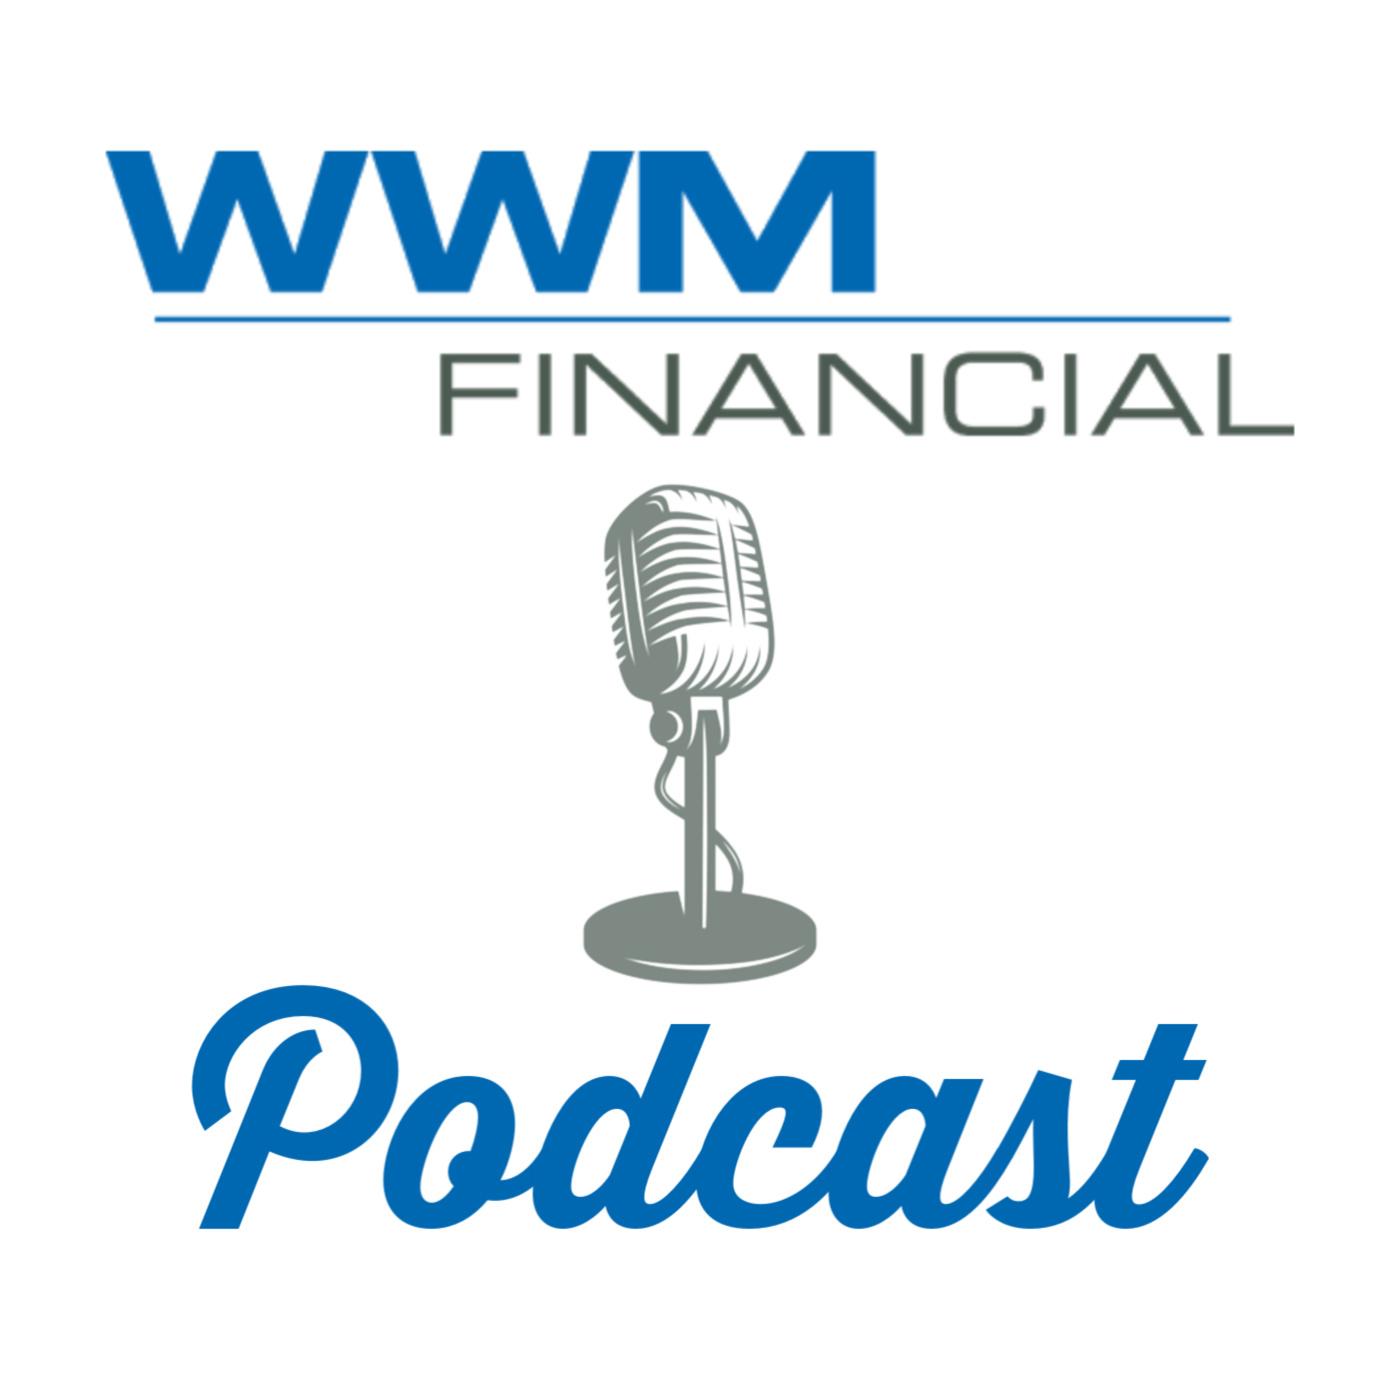 The WWM Financial Podcast show art